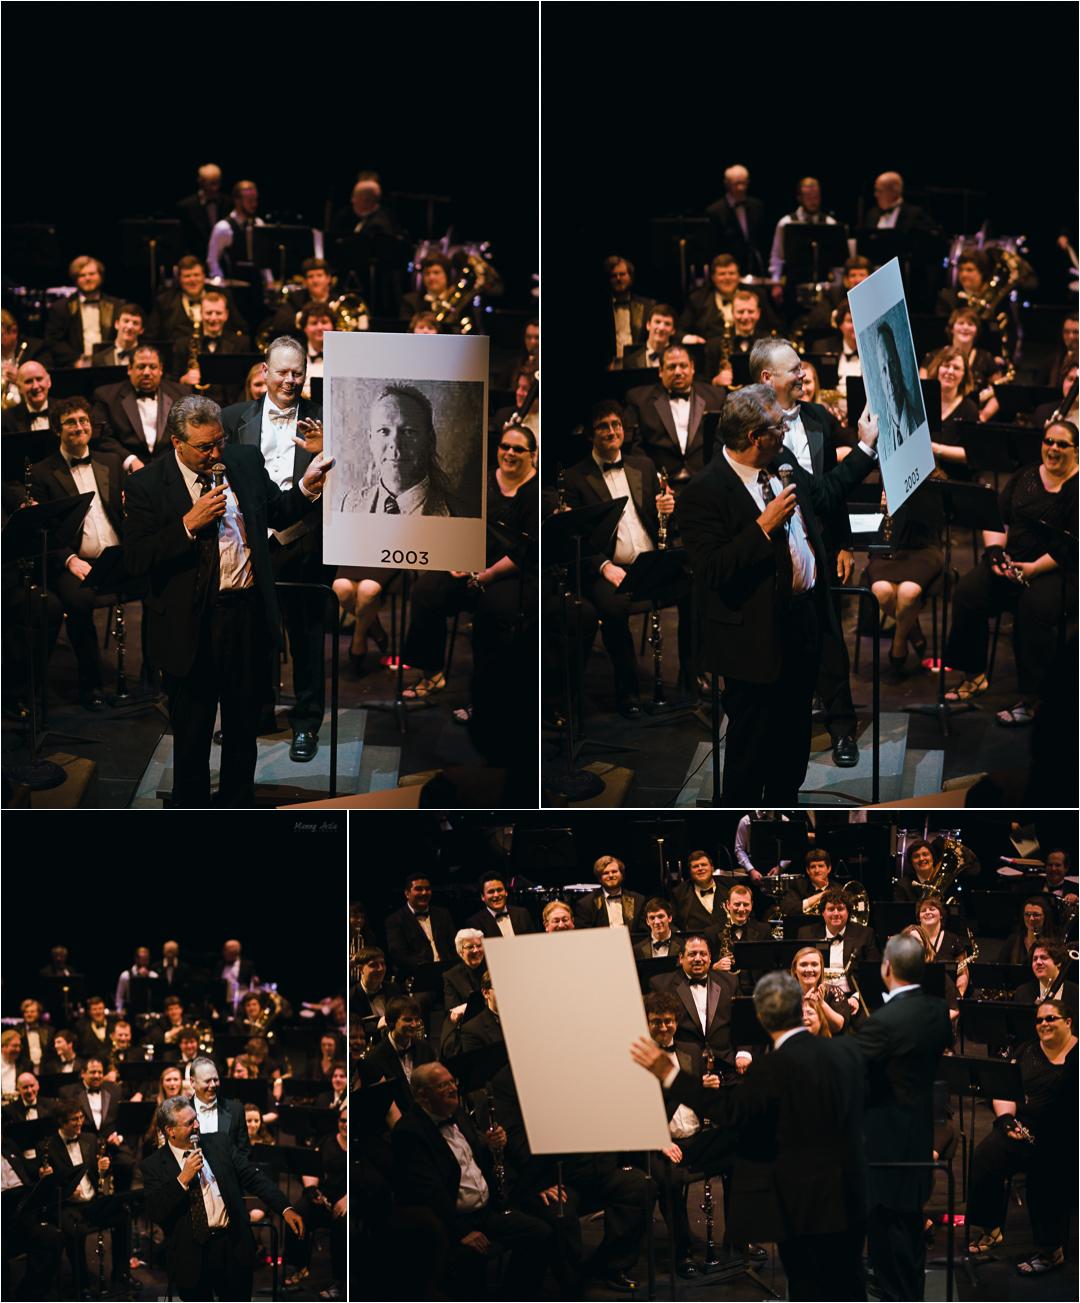 music performance photos